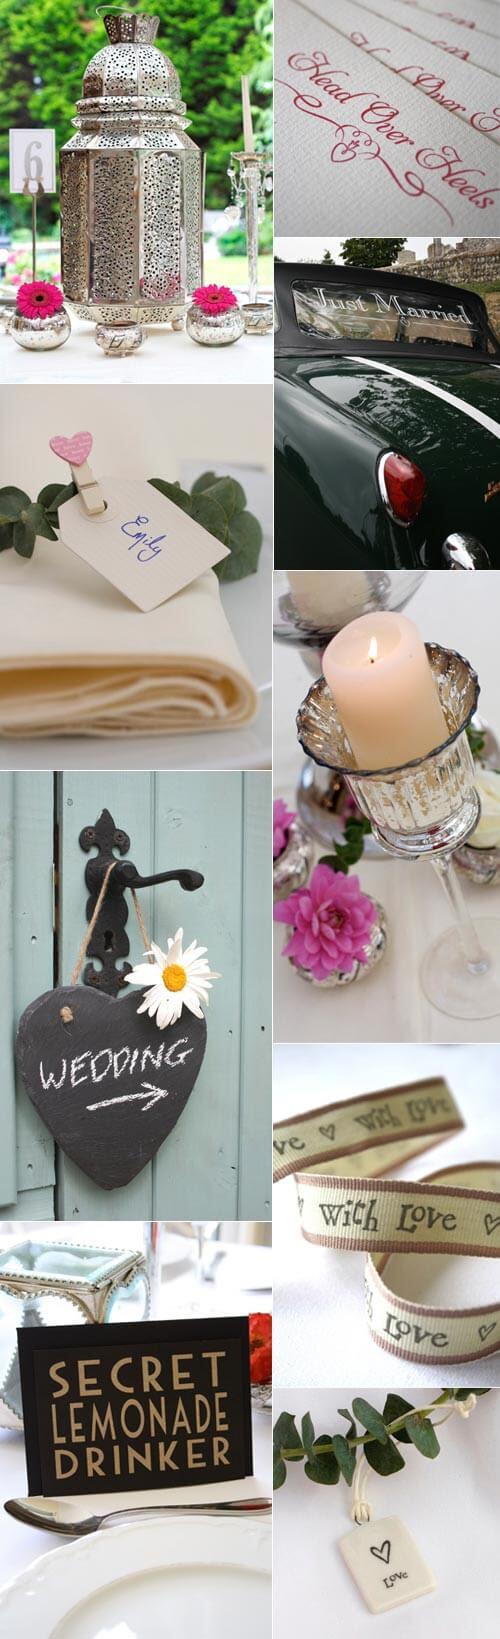 wedding hair accessories, wedding cakes, wedding dresses ring pillow, wedding accessories-23